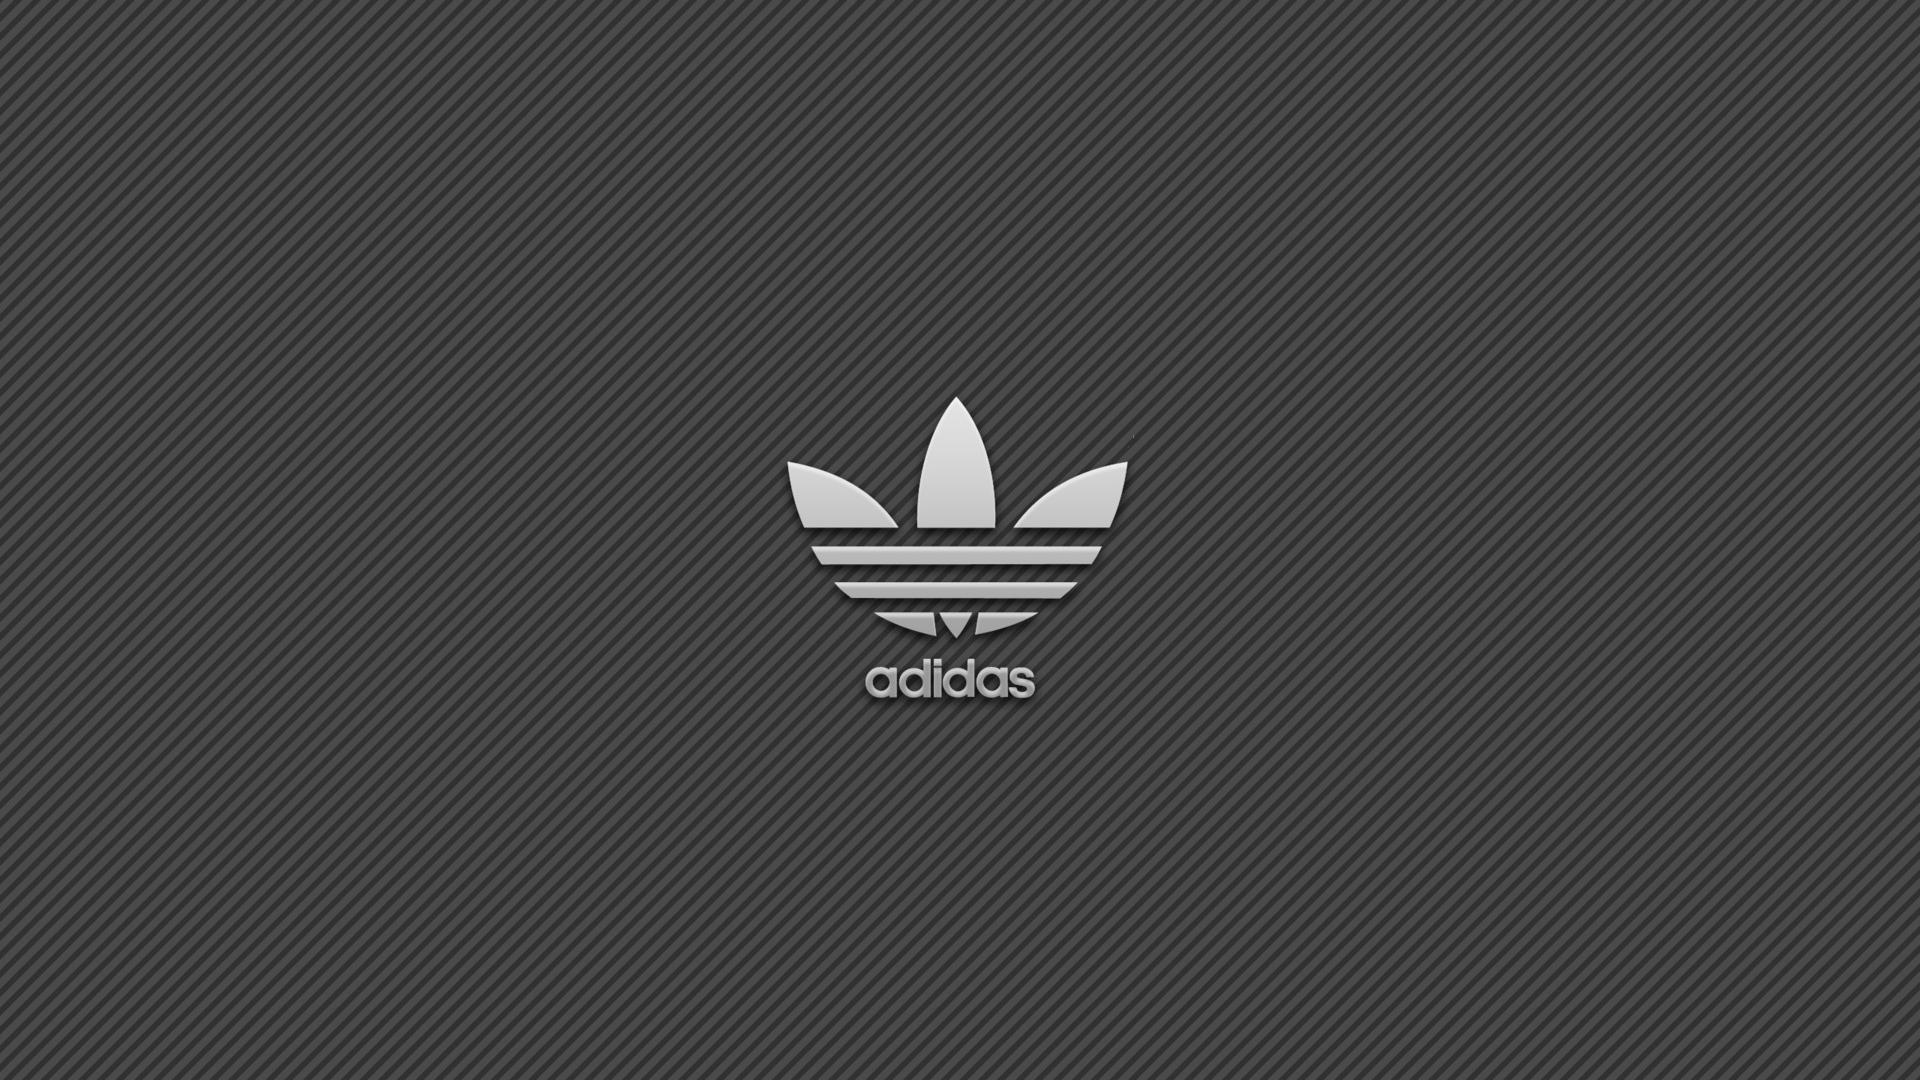 Download Wallpaper 1920x1080 Adidas Brand Logo Full HD 1920x1080